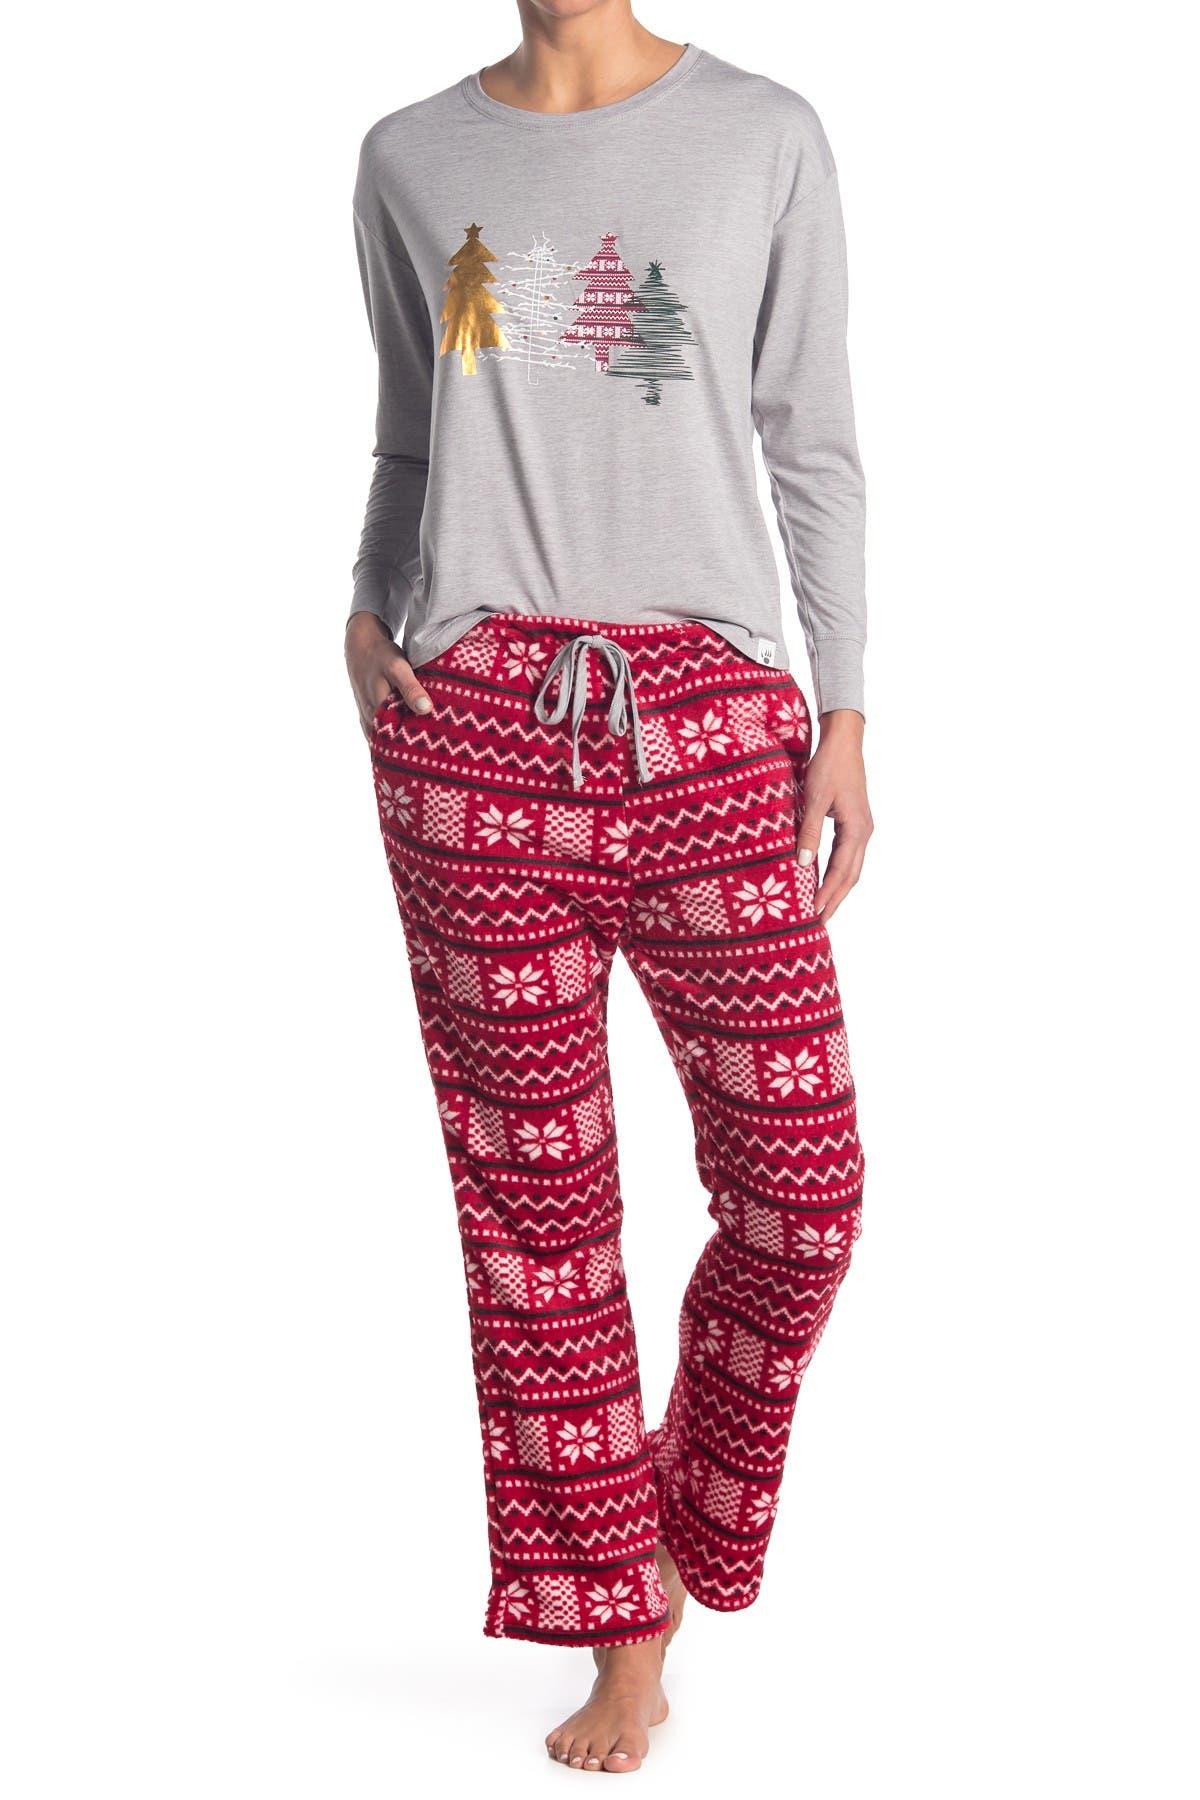 Image of BEARPAW Printed Top & Pant 2-Piece Pajama Set